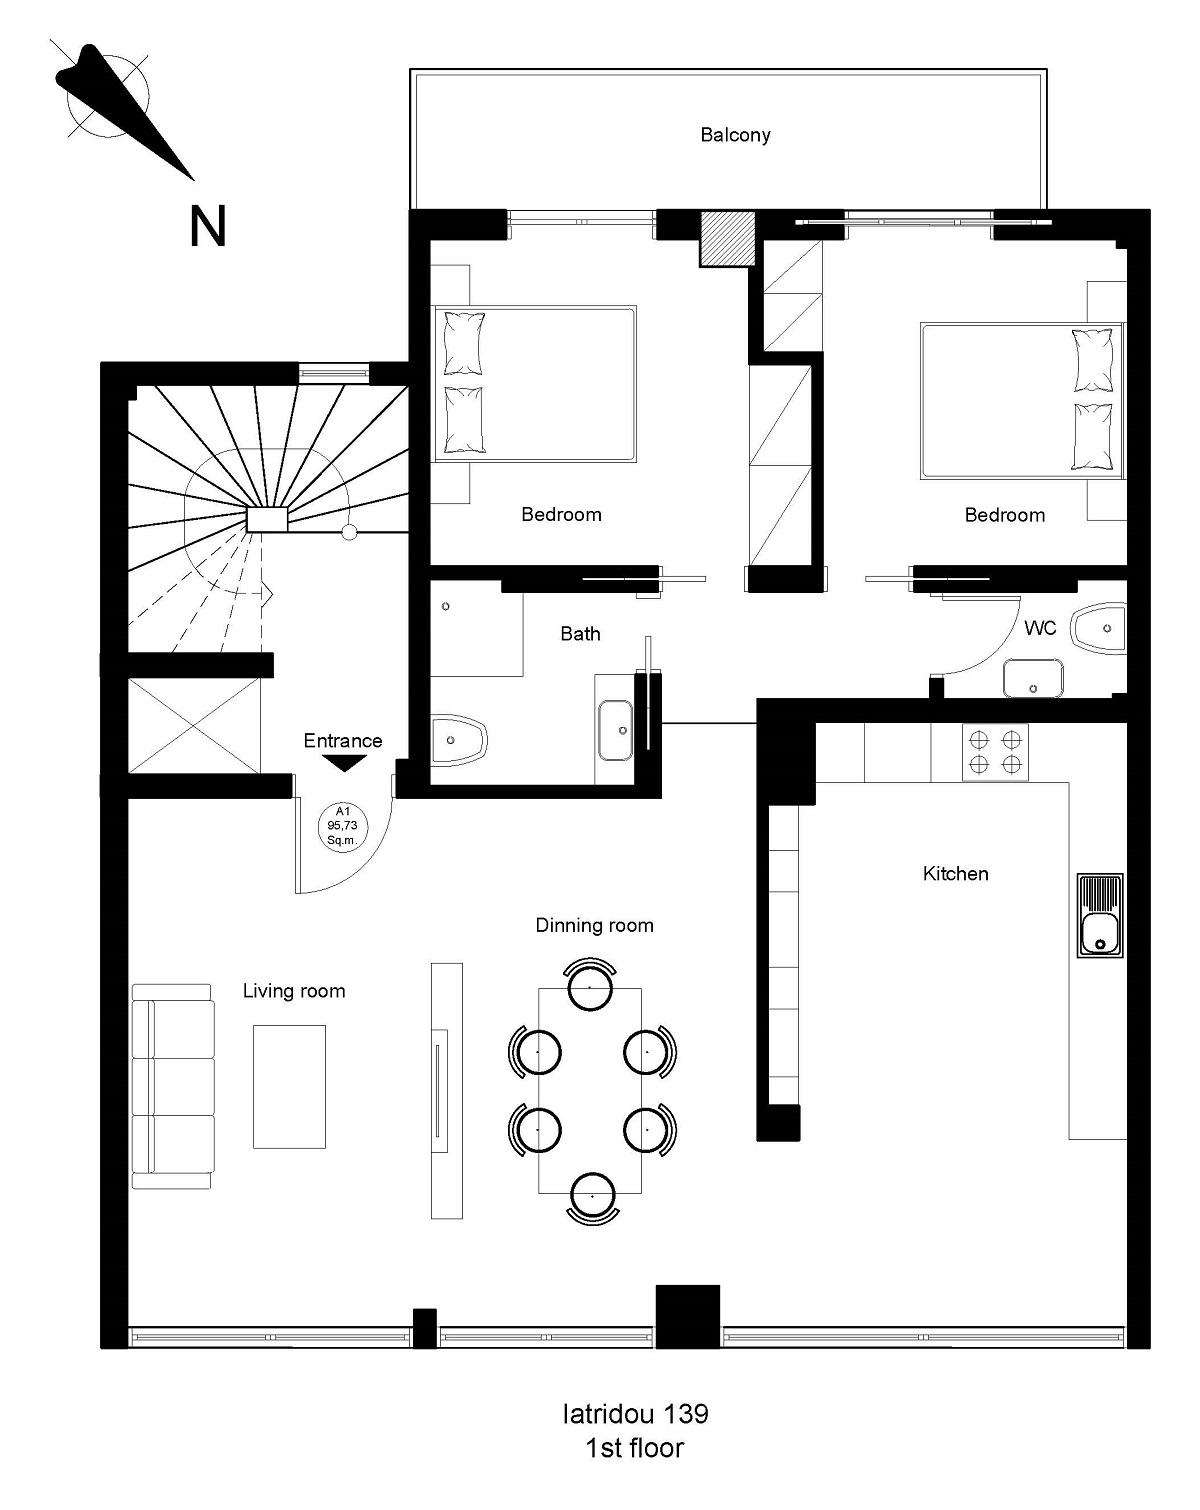 Iatridou 139 1st floor plan